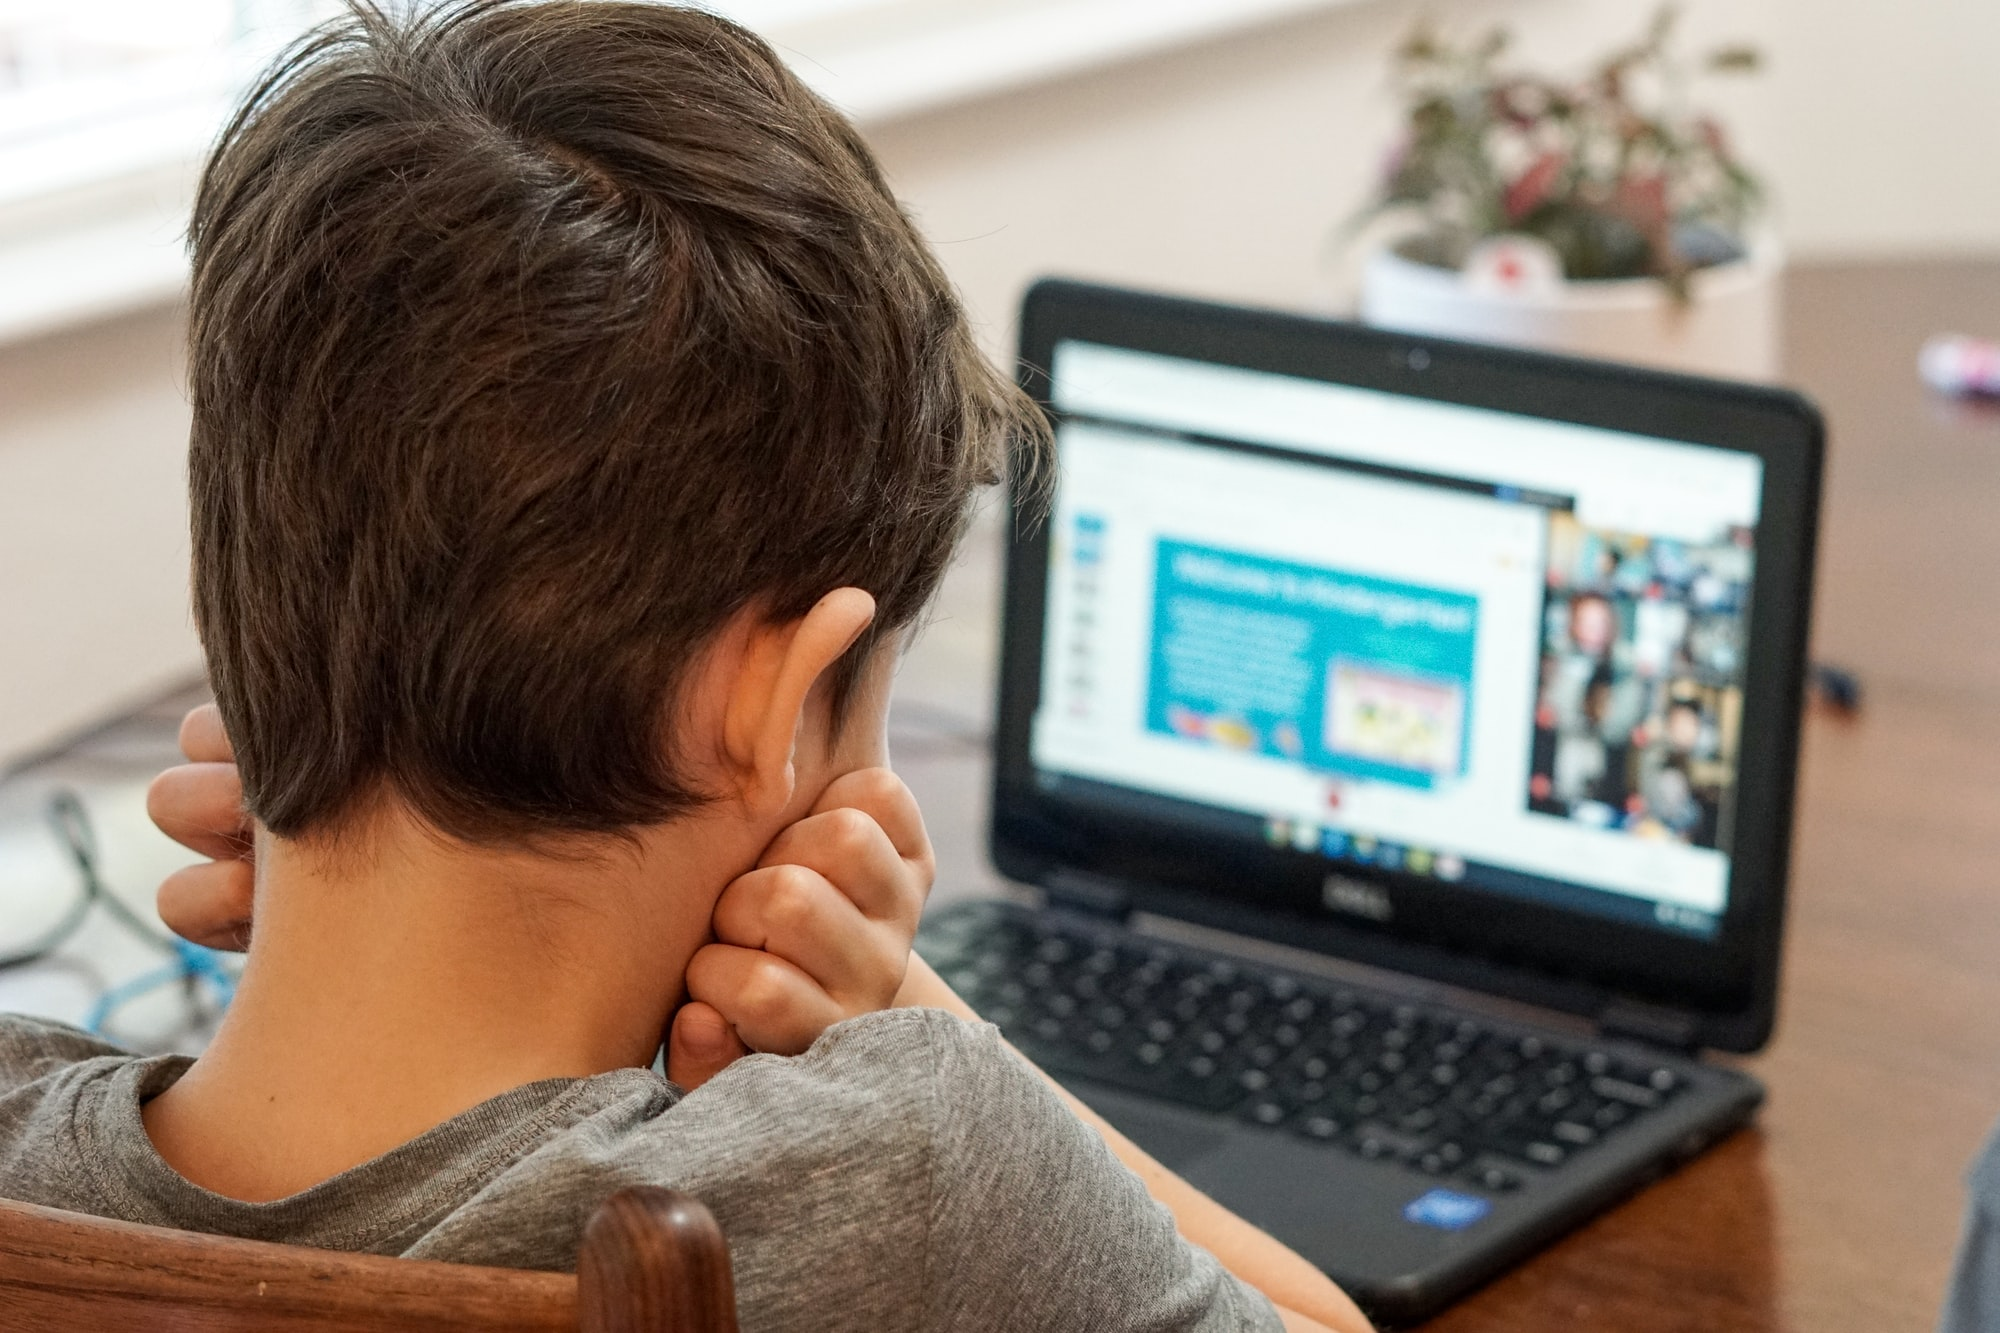 An unprecedented educational disruption